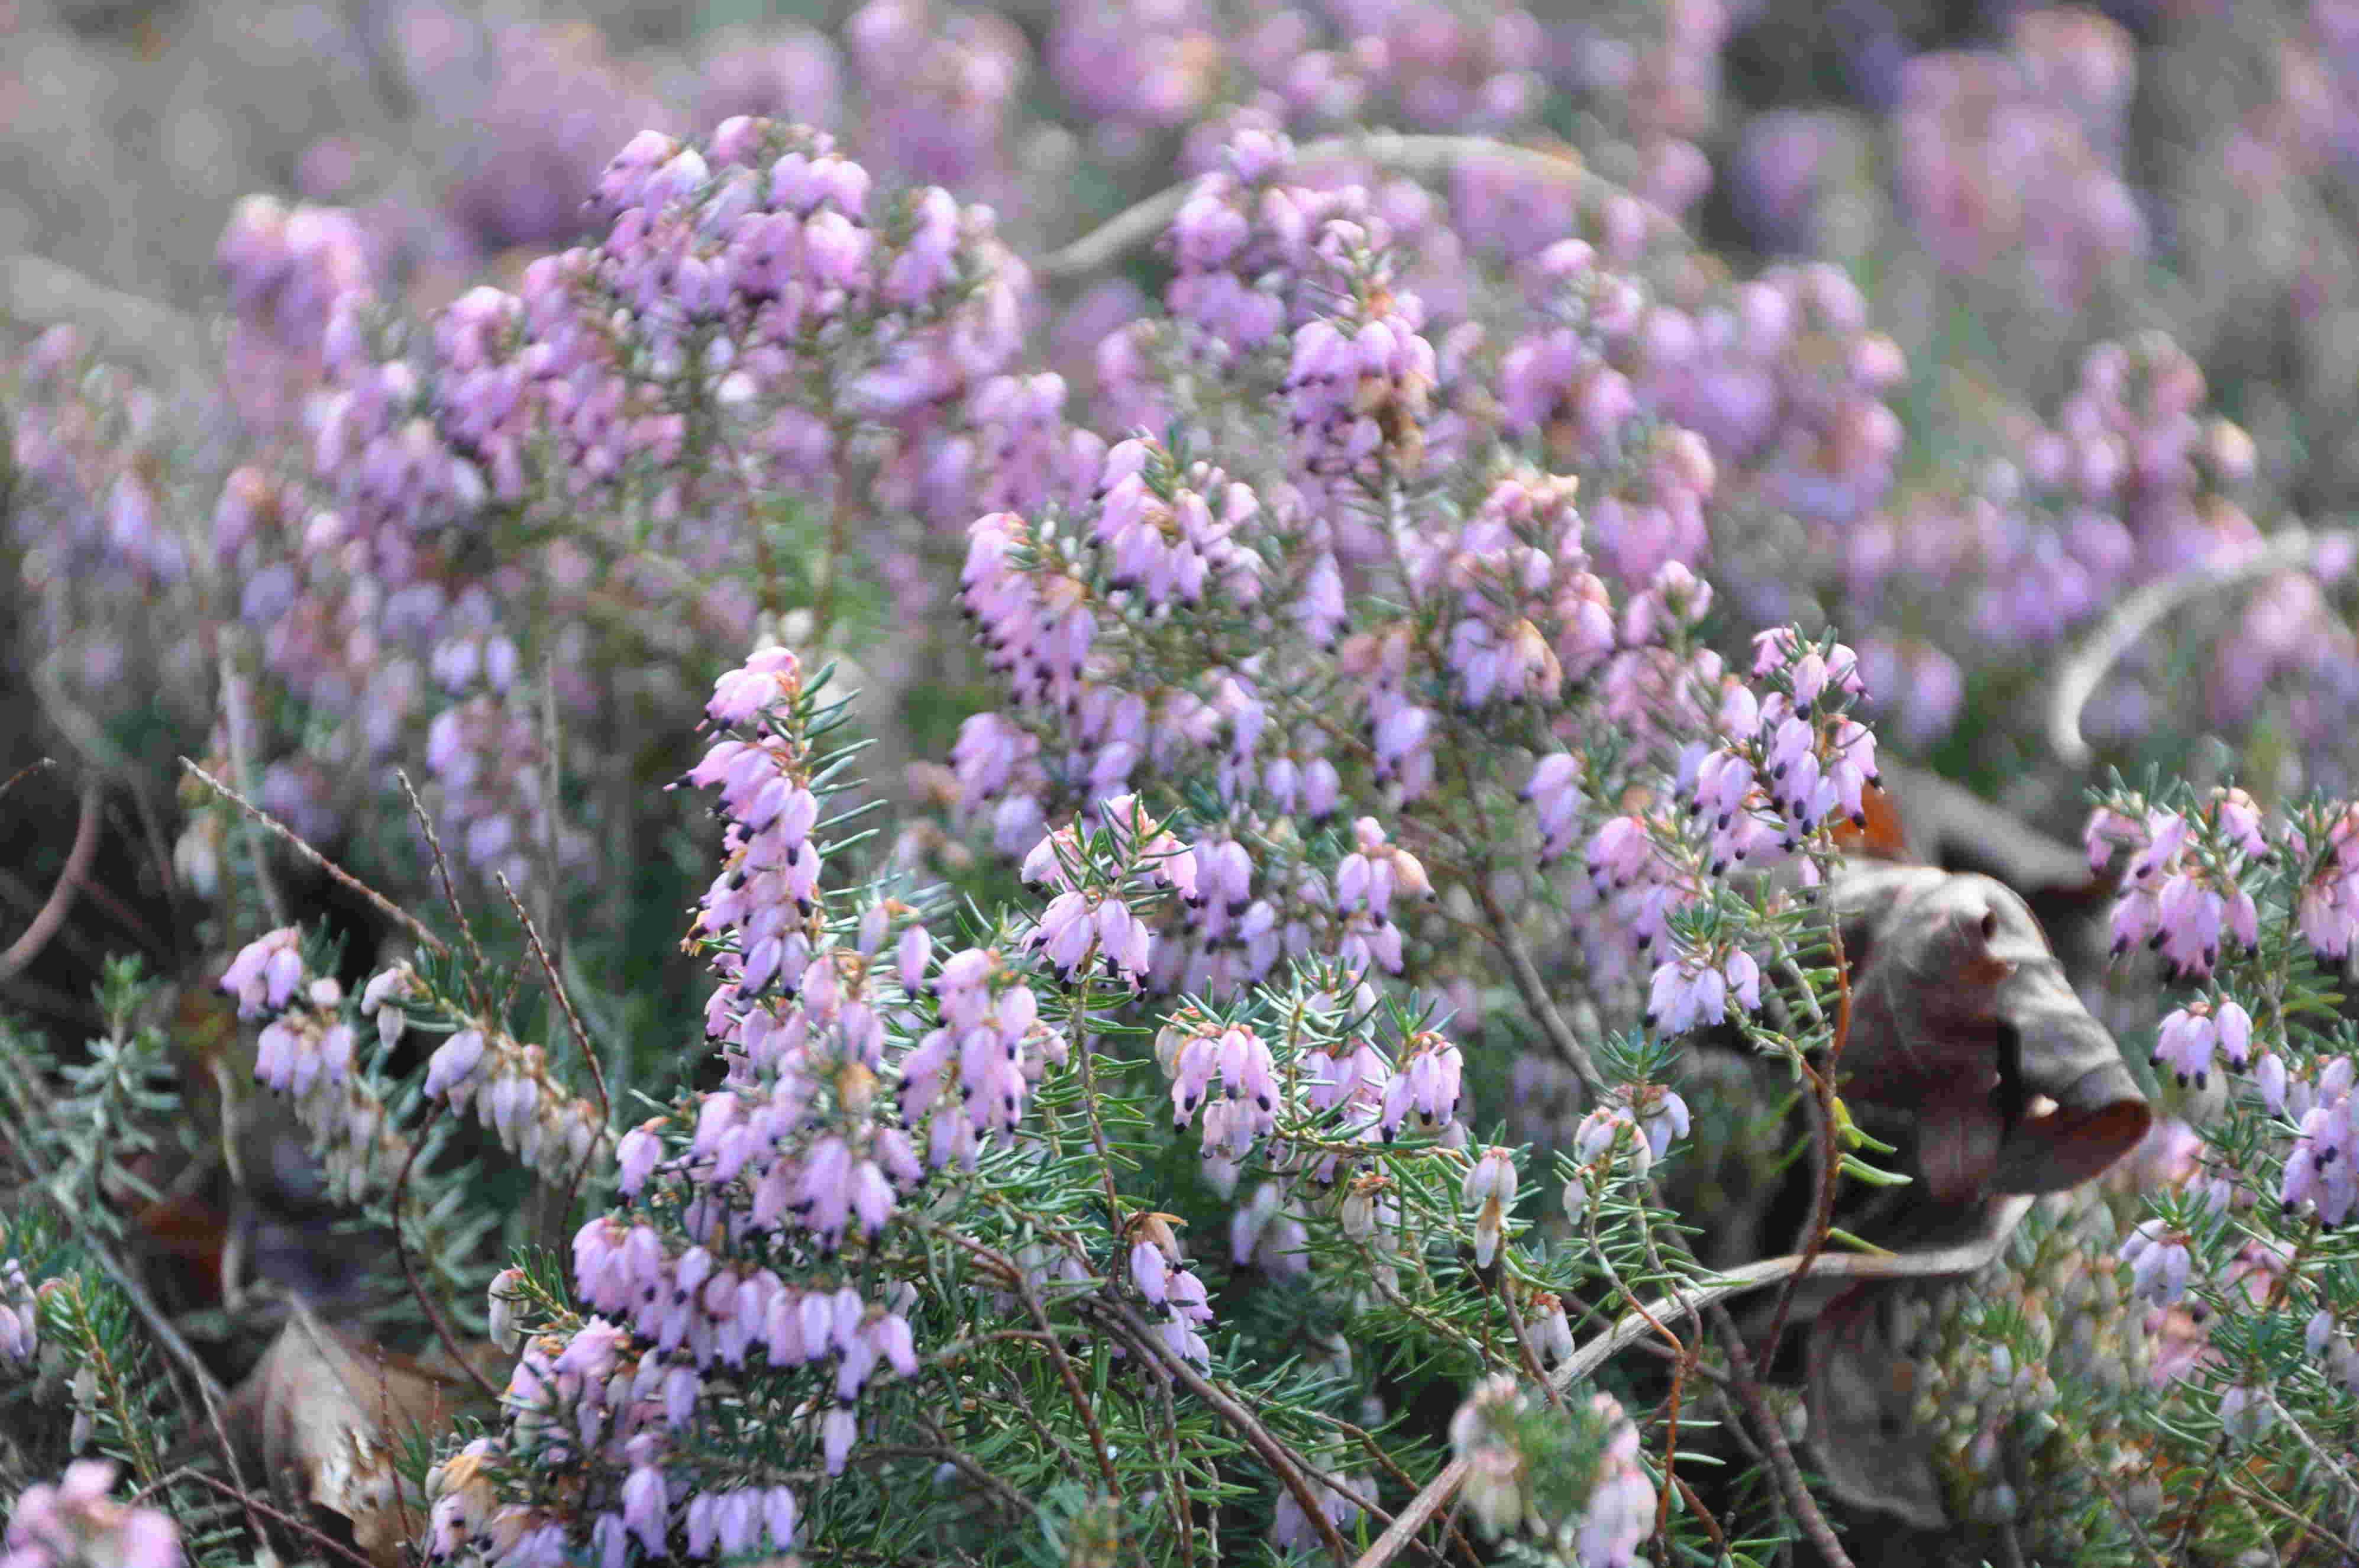 Ljungväxter trivs i sur jord med lågt pH.